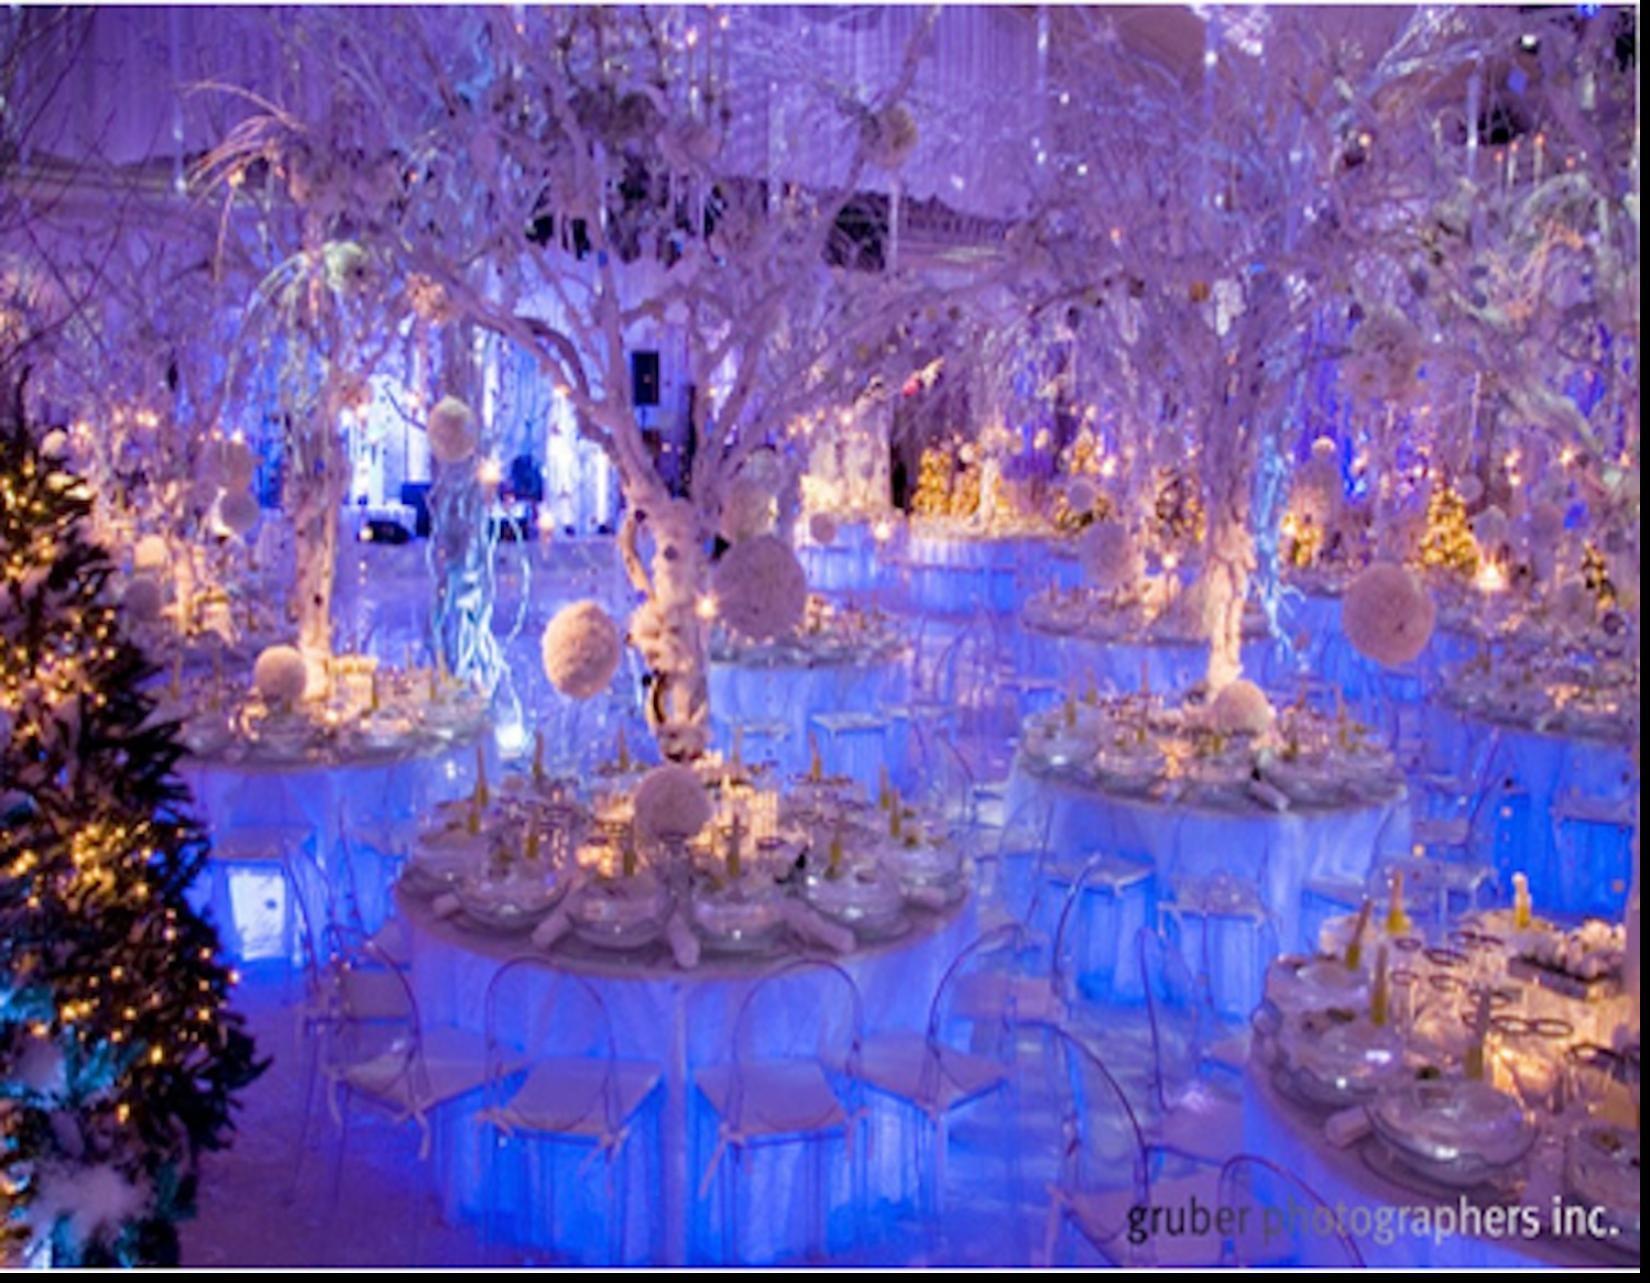 Pinterest Winter Wedding Centerpieces: Astounding Winter Wonderland Theme Wedding Reception With